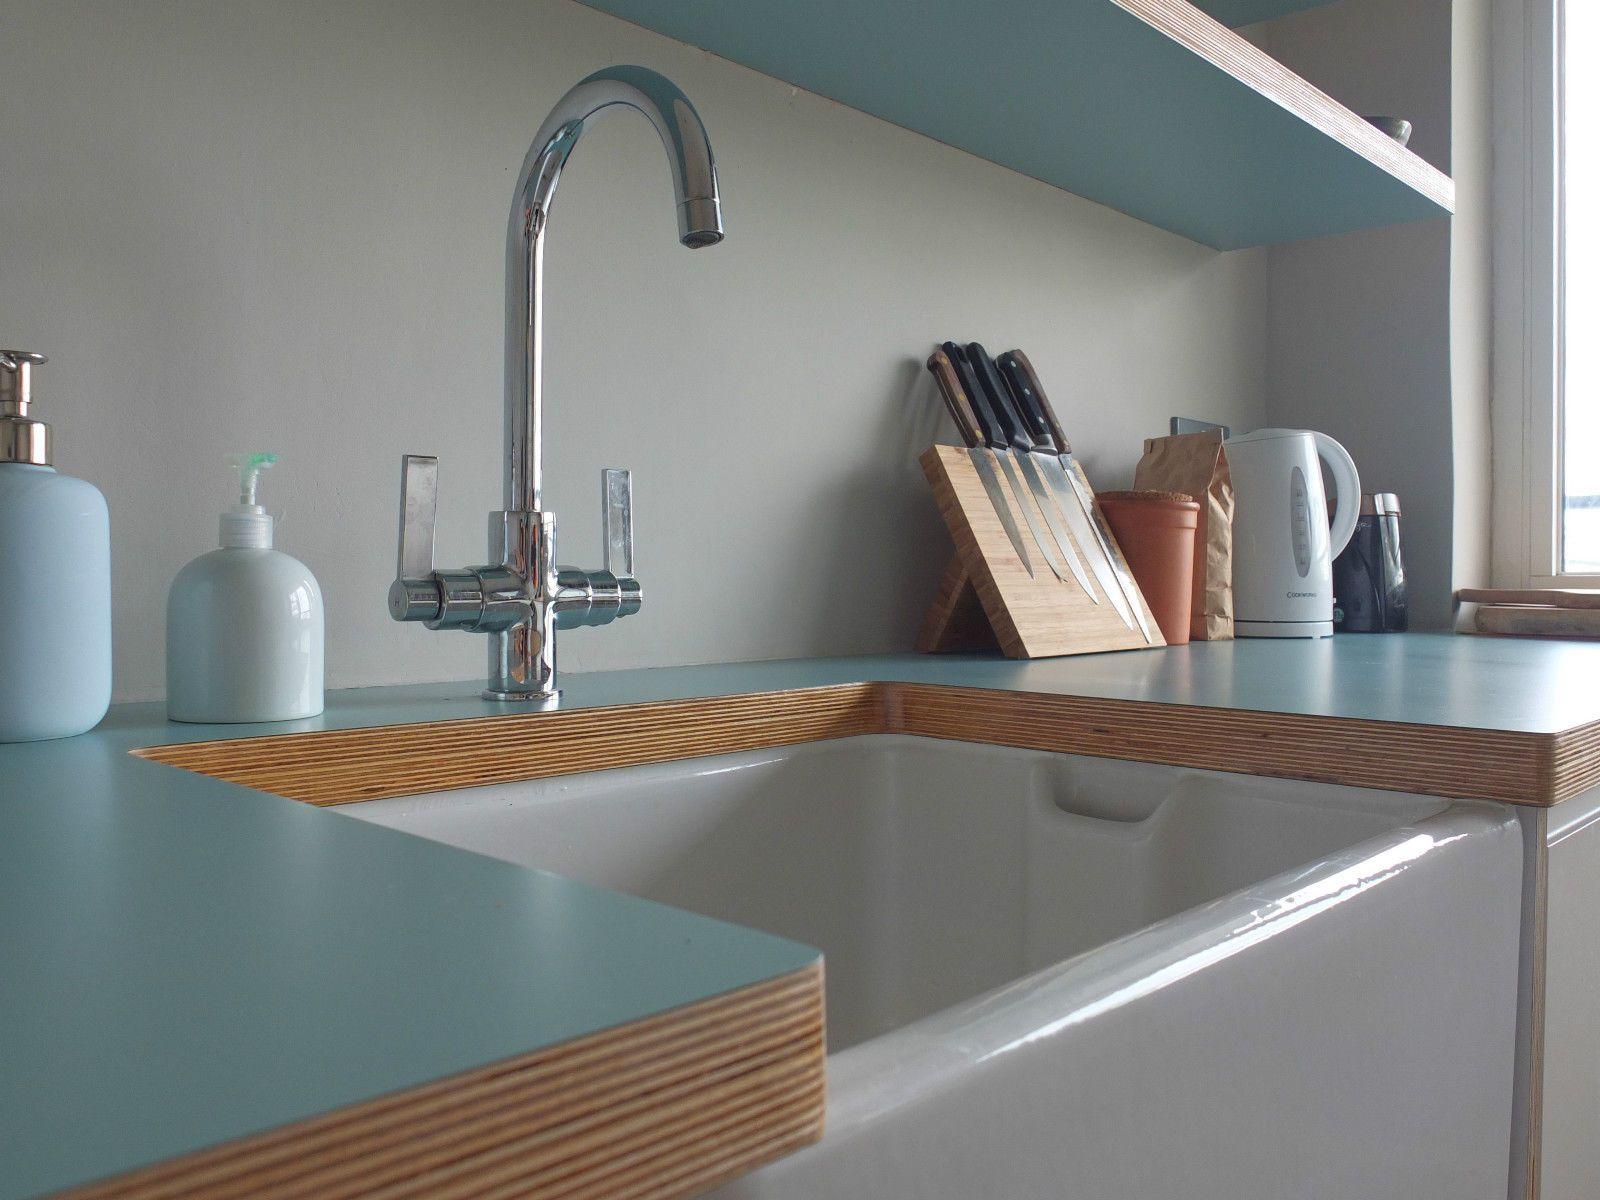 Details about Birch Plywood and Laminate Kitchen Worktop